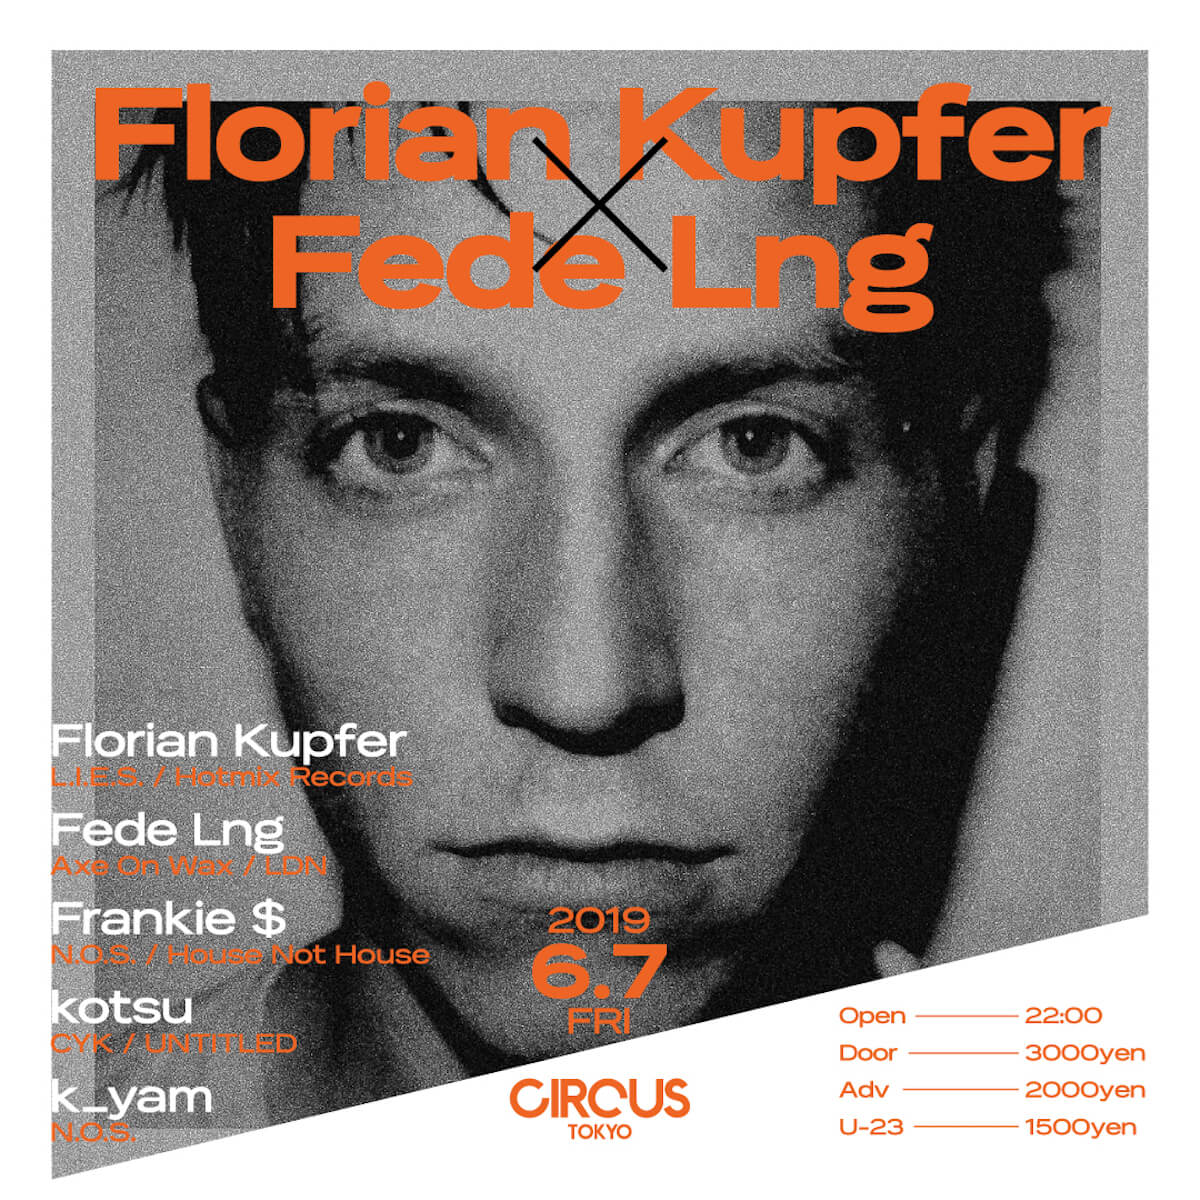 <FFKT>にも出演!Florian KupferのJapan Tourが決定|〈L.I.E.S. Records〉からもリリース music190425_floriankupfer_2